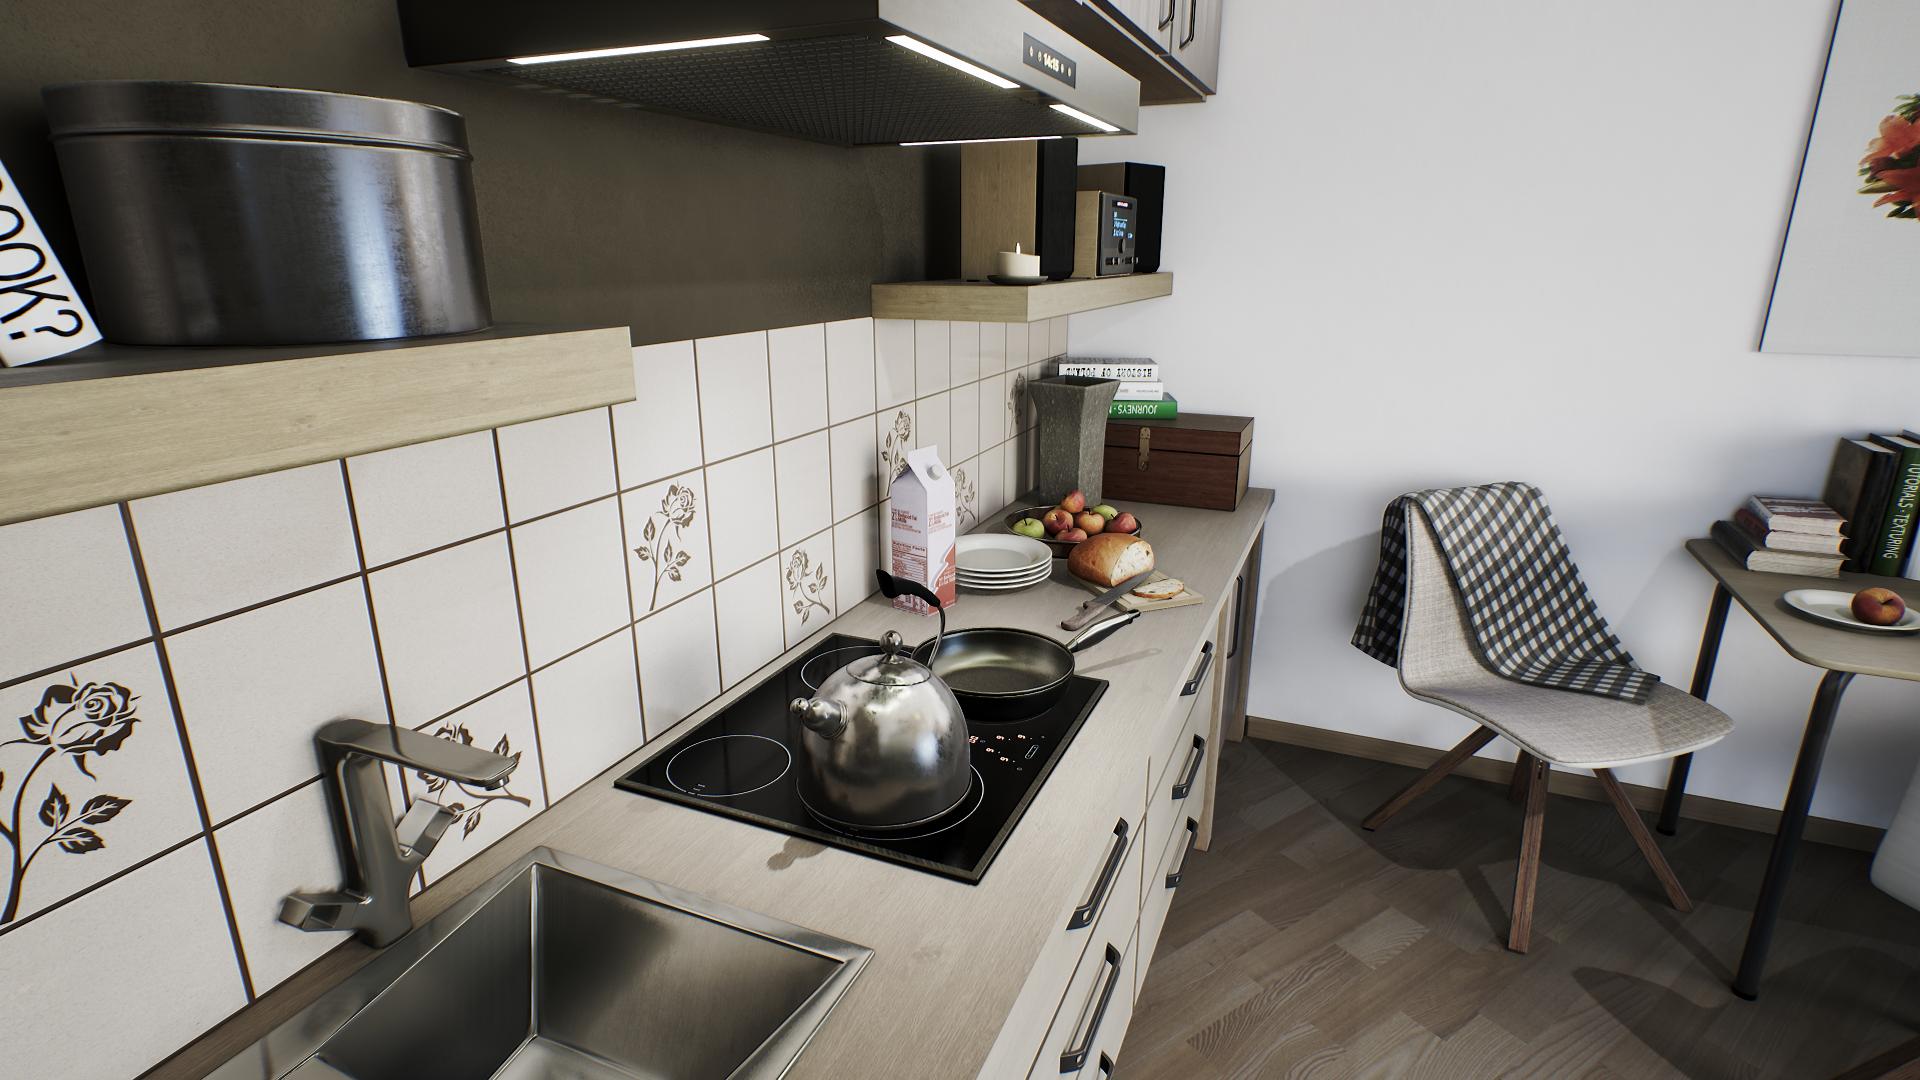 Fondos de pantalla : habitación, cocina, diseño de interiores ...